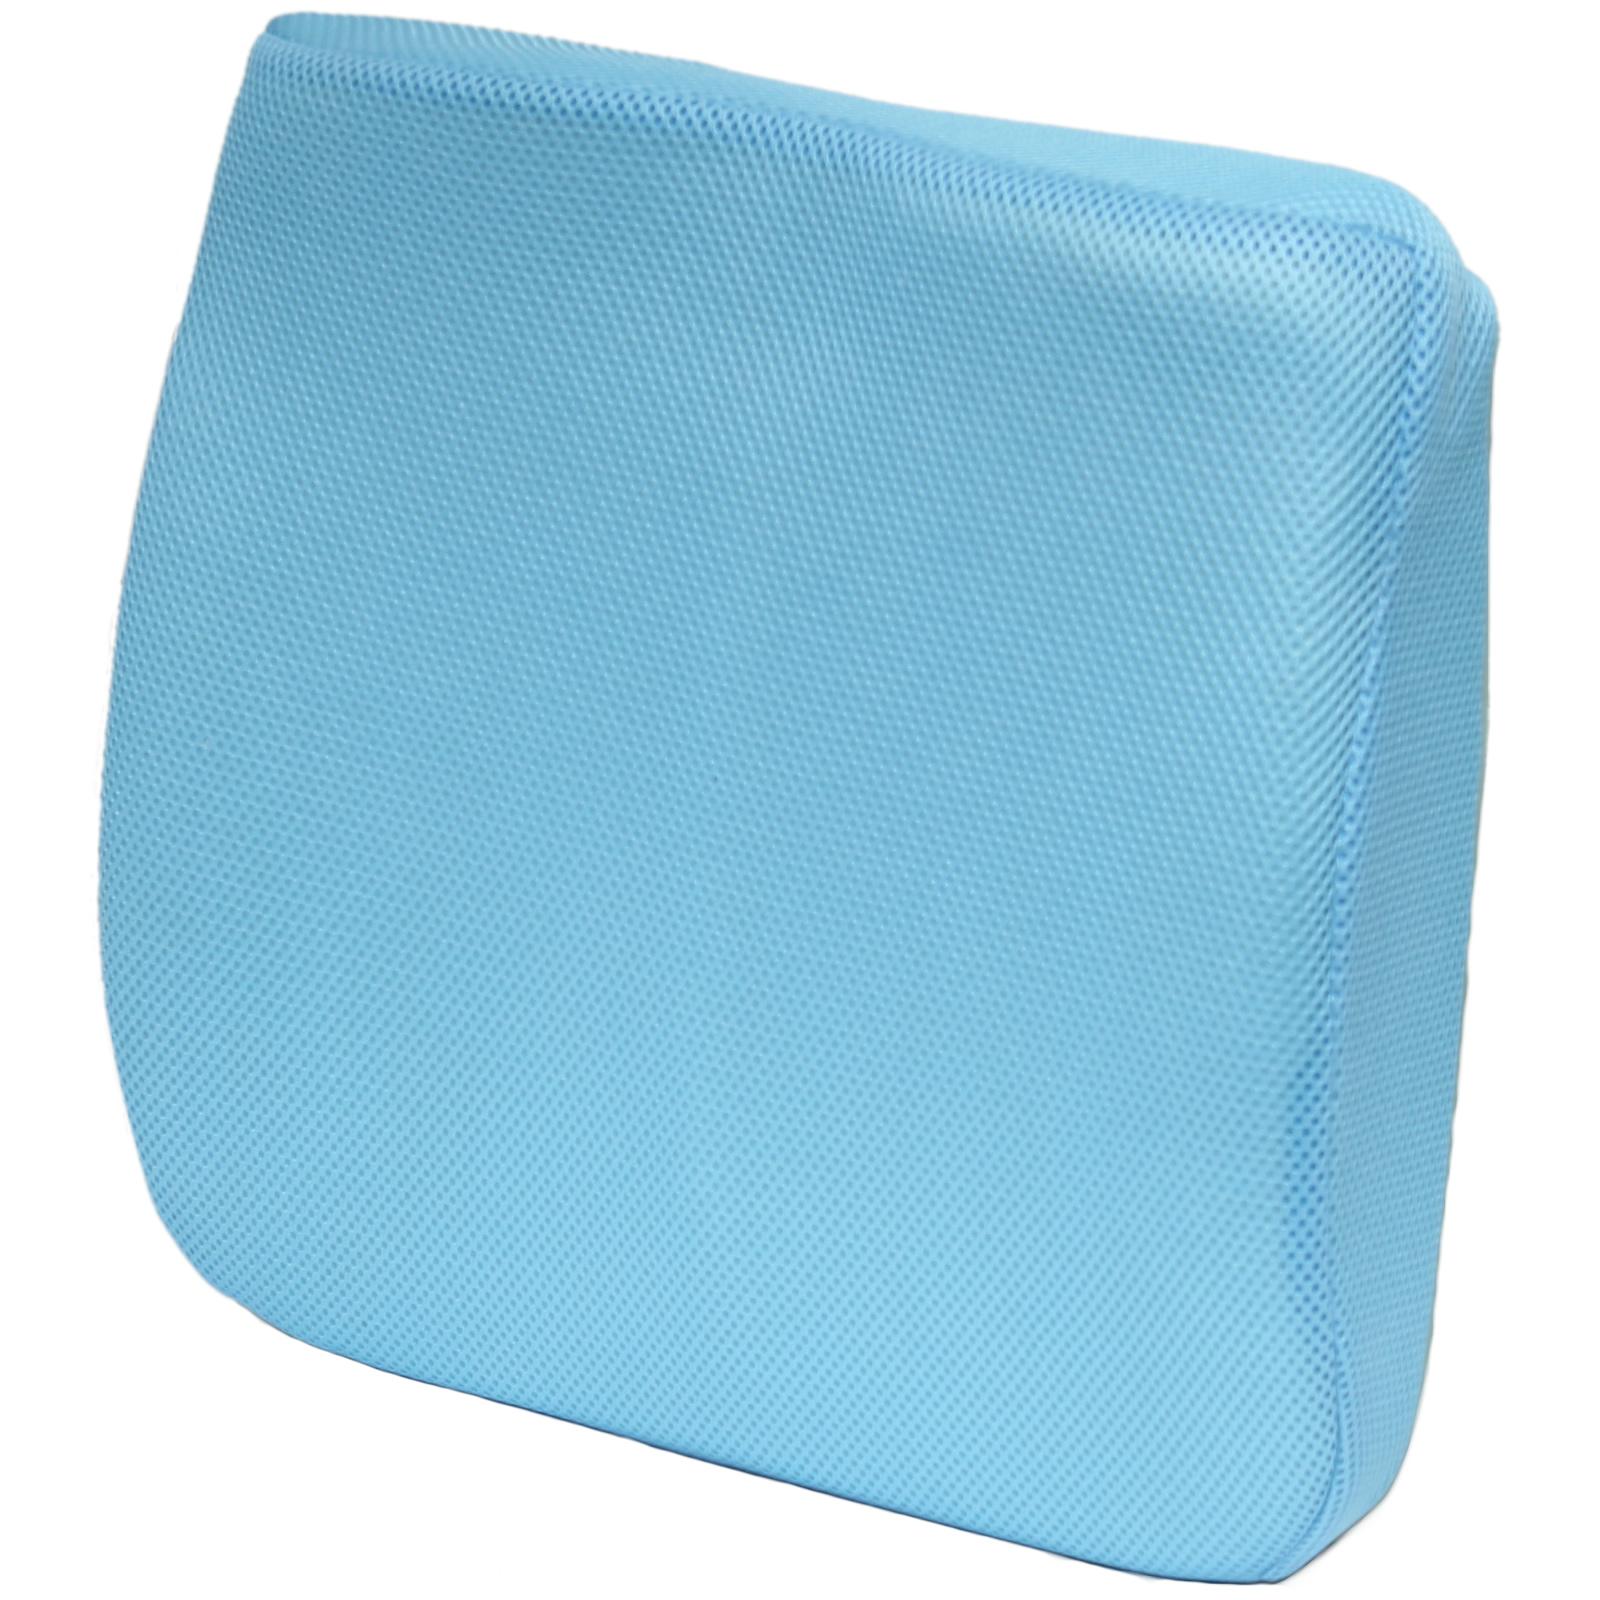 memory foam desk chair cushion air horn under office prank 3d mesh seat lower back lumbar support